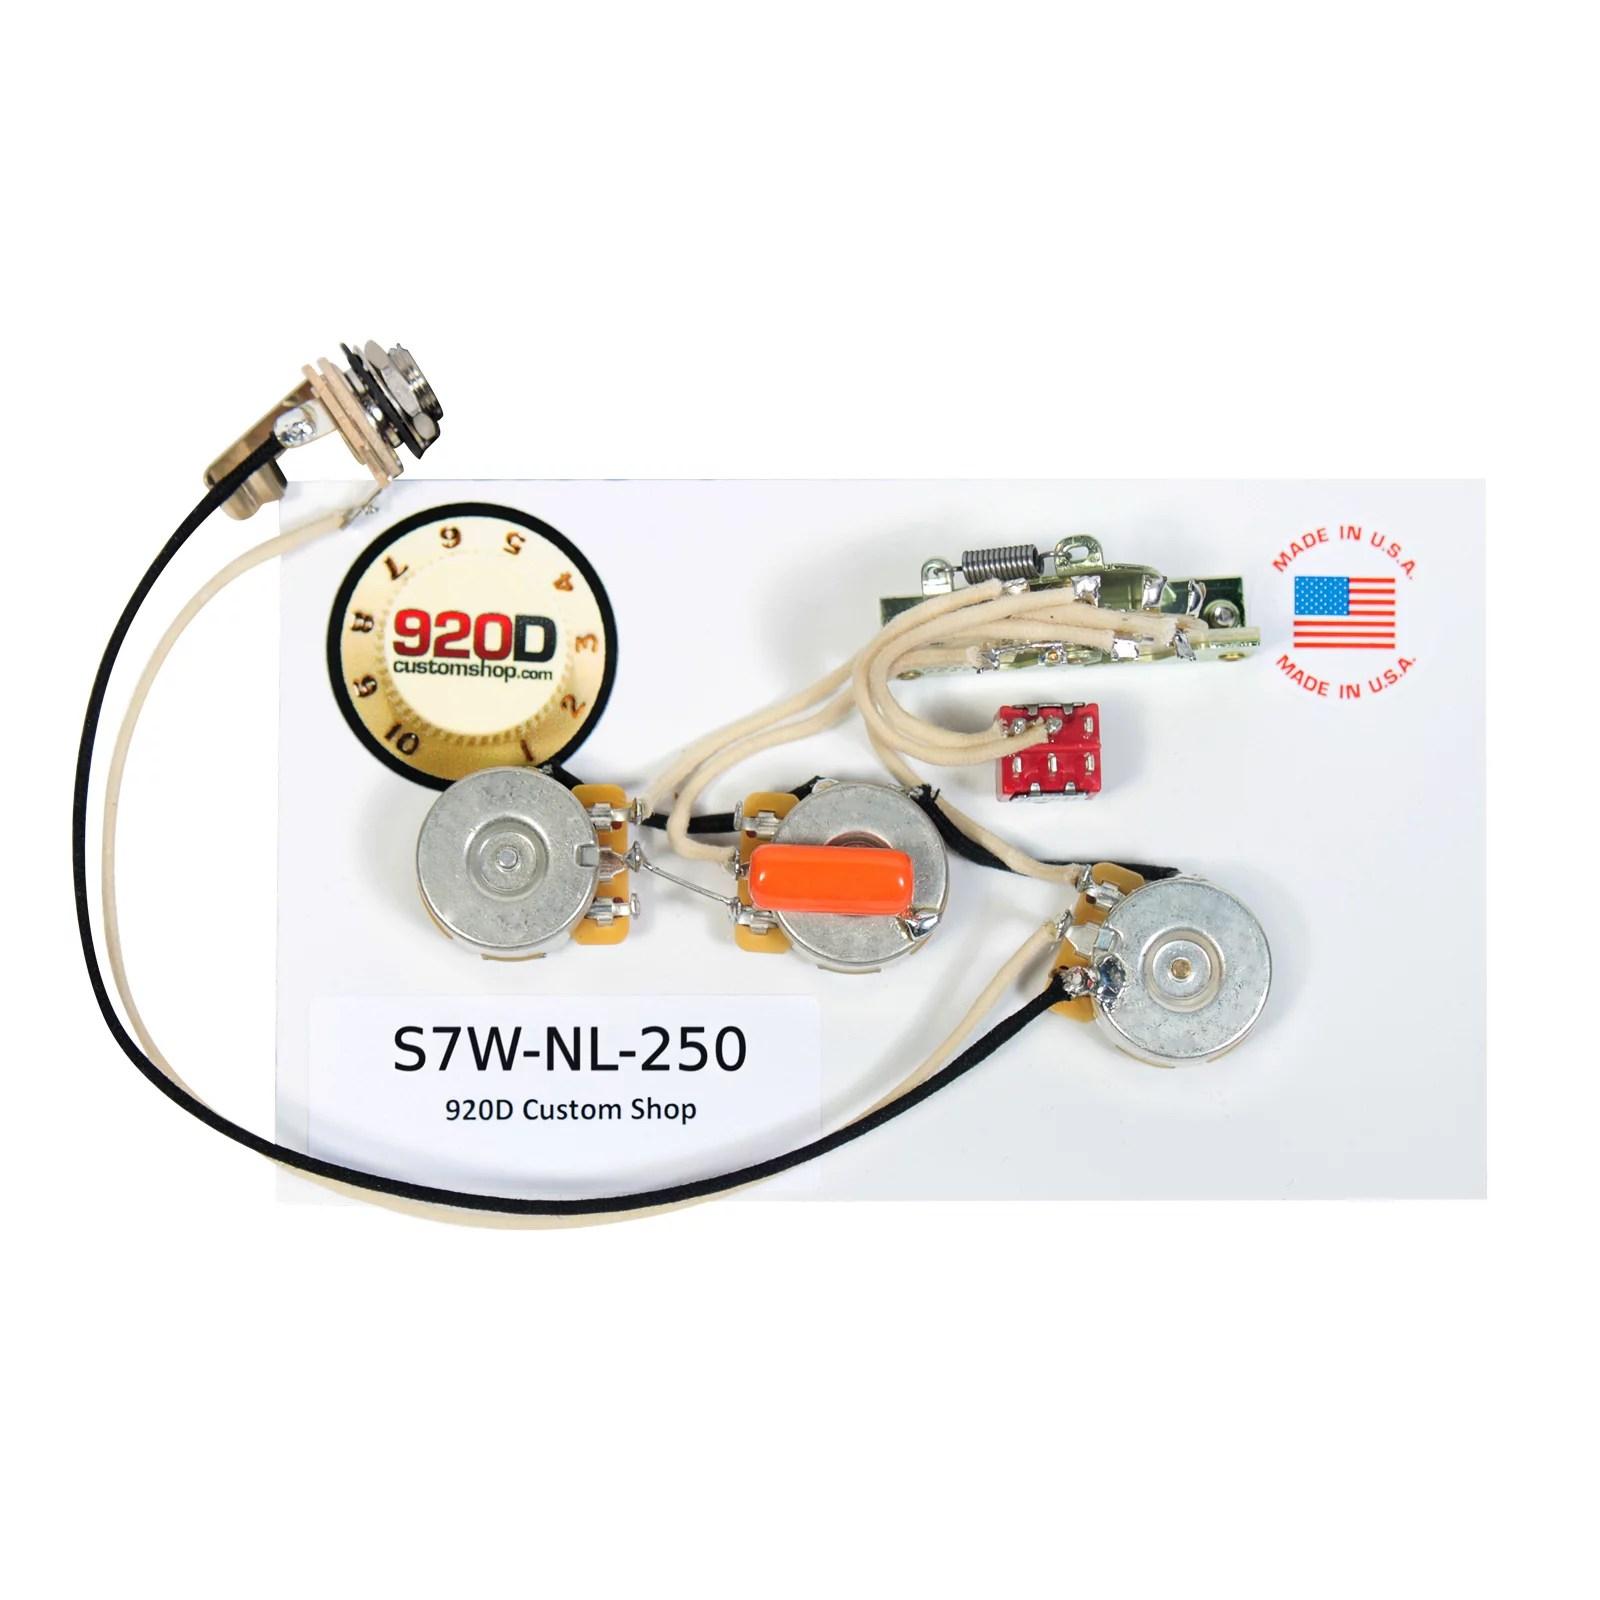 hight resolution of fender strat 7 way wiring kit w 2 no load 250k 022 f cap fender esquire wiring kit fender wiring kit